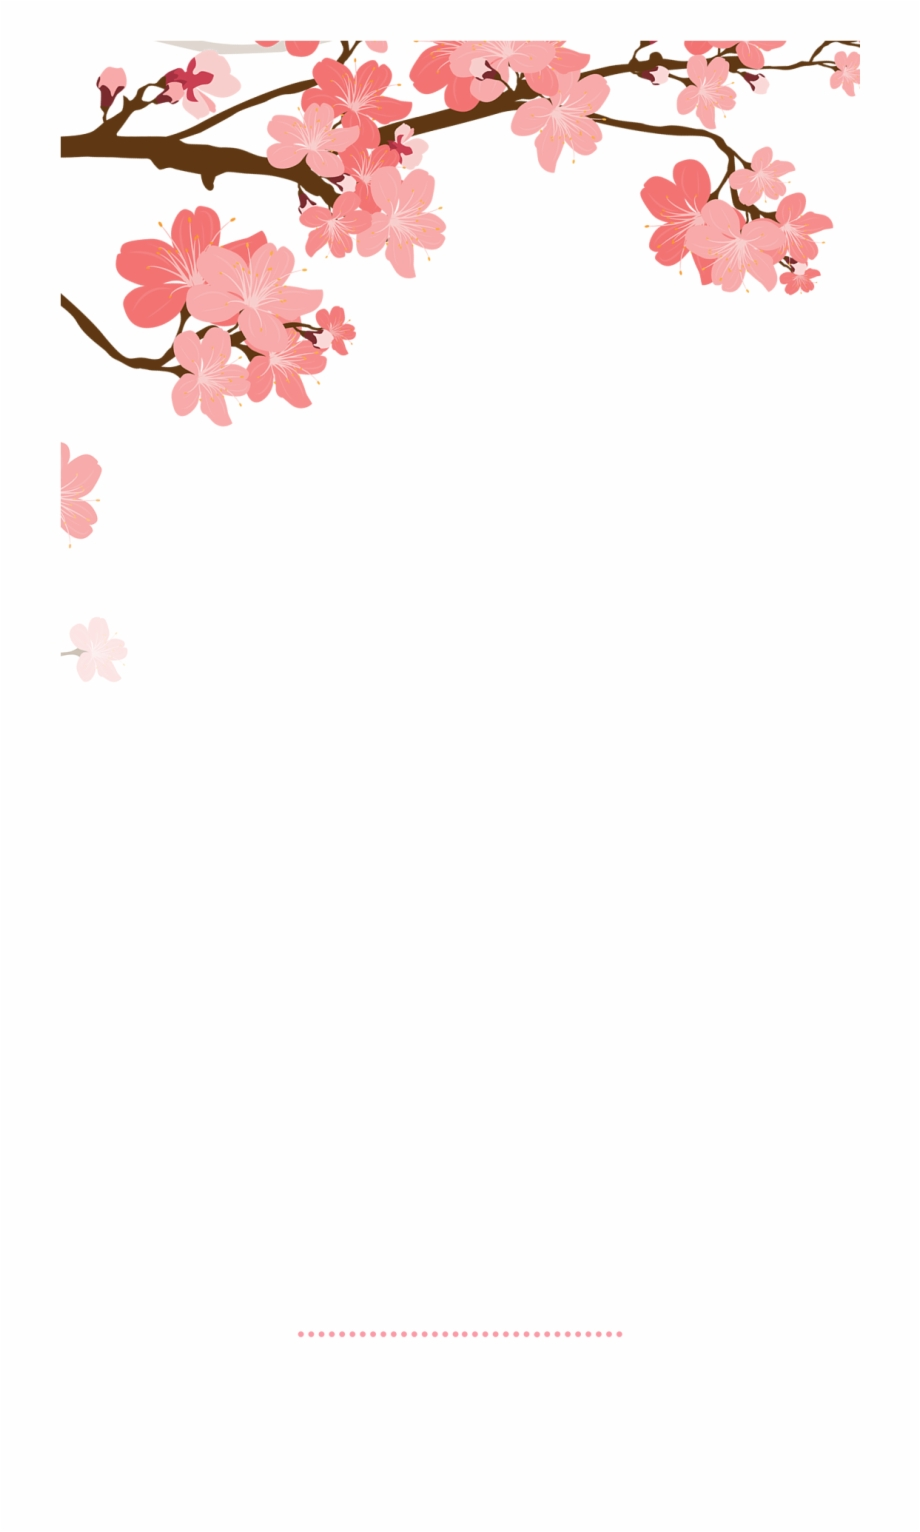 Snapchat Filters Wedding Transpa Png Clipart Free.